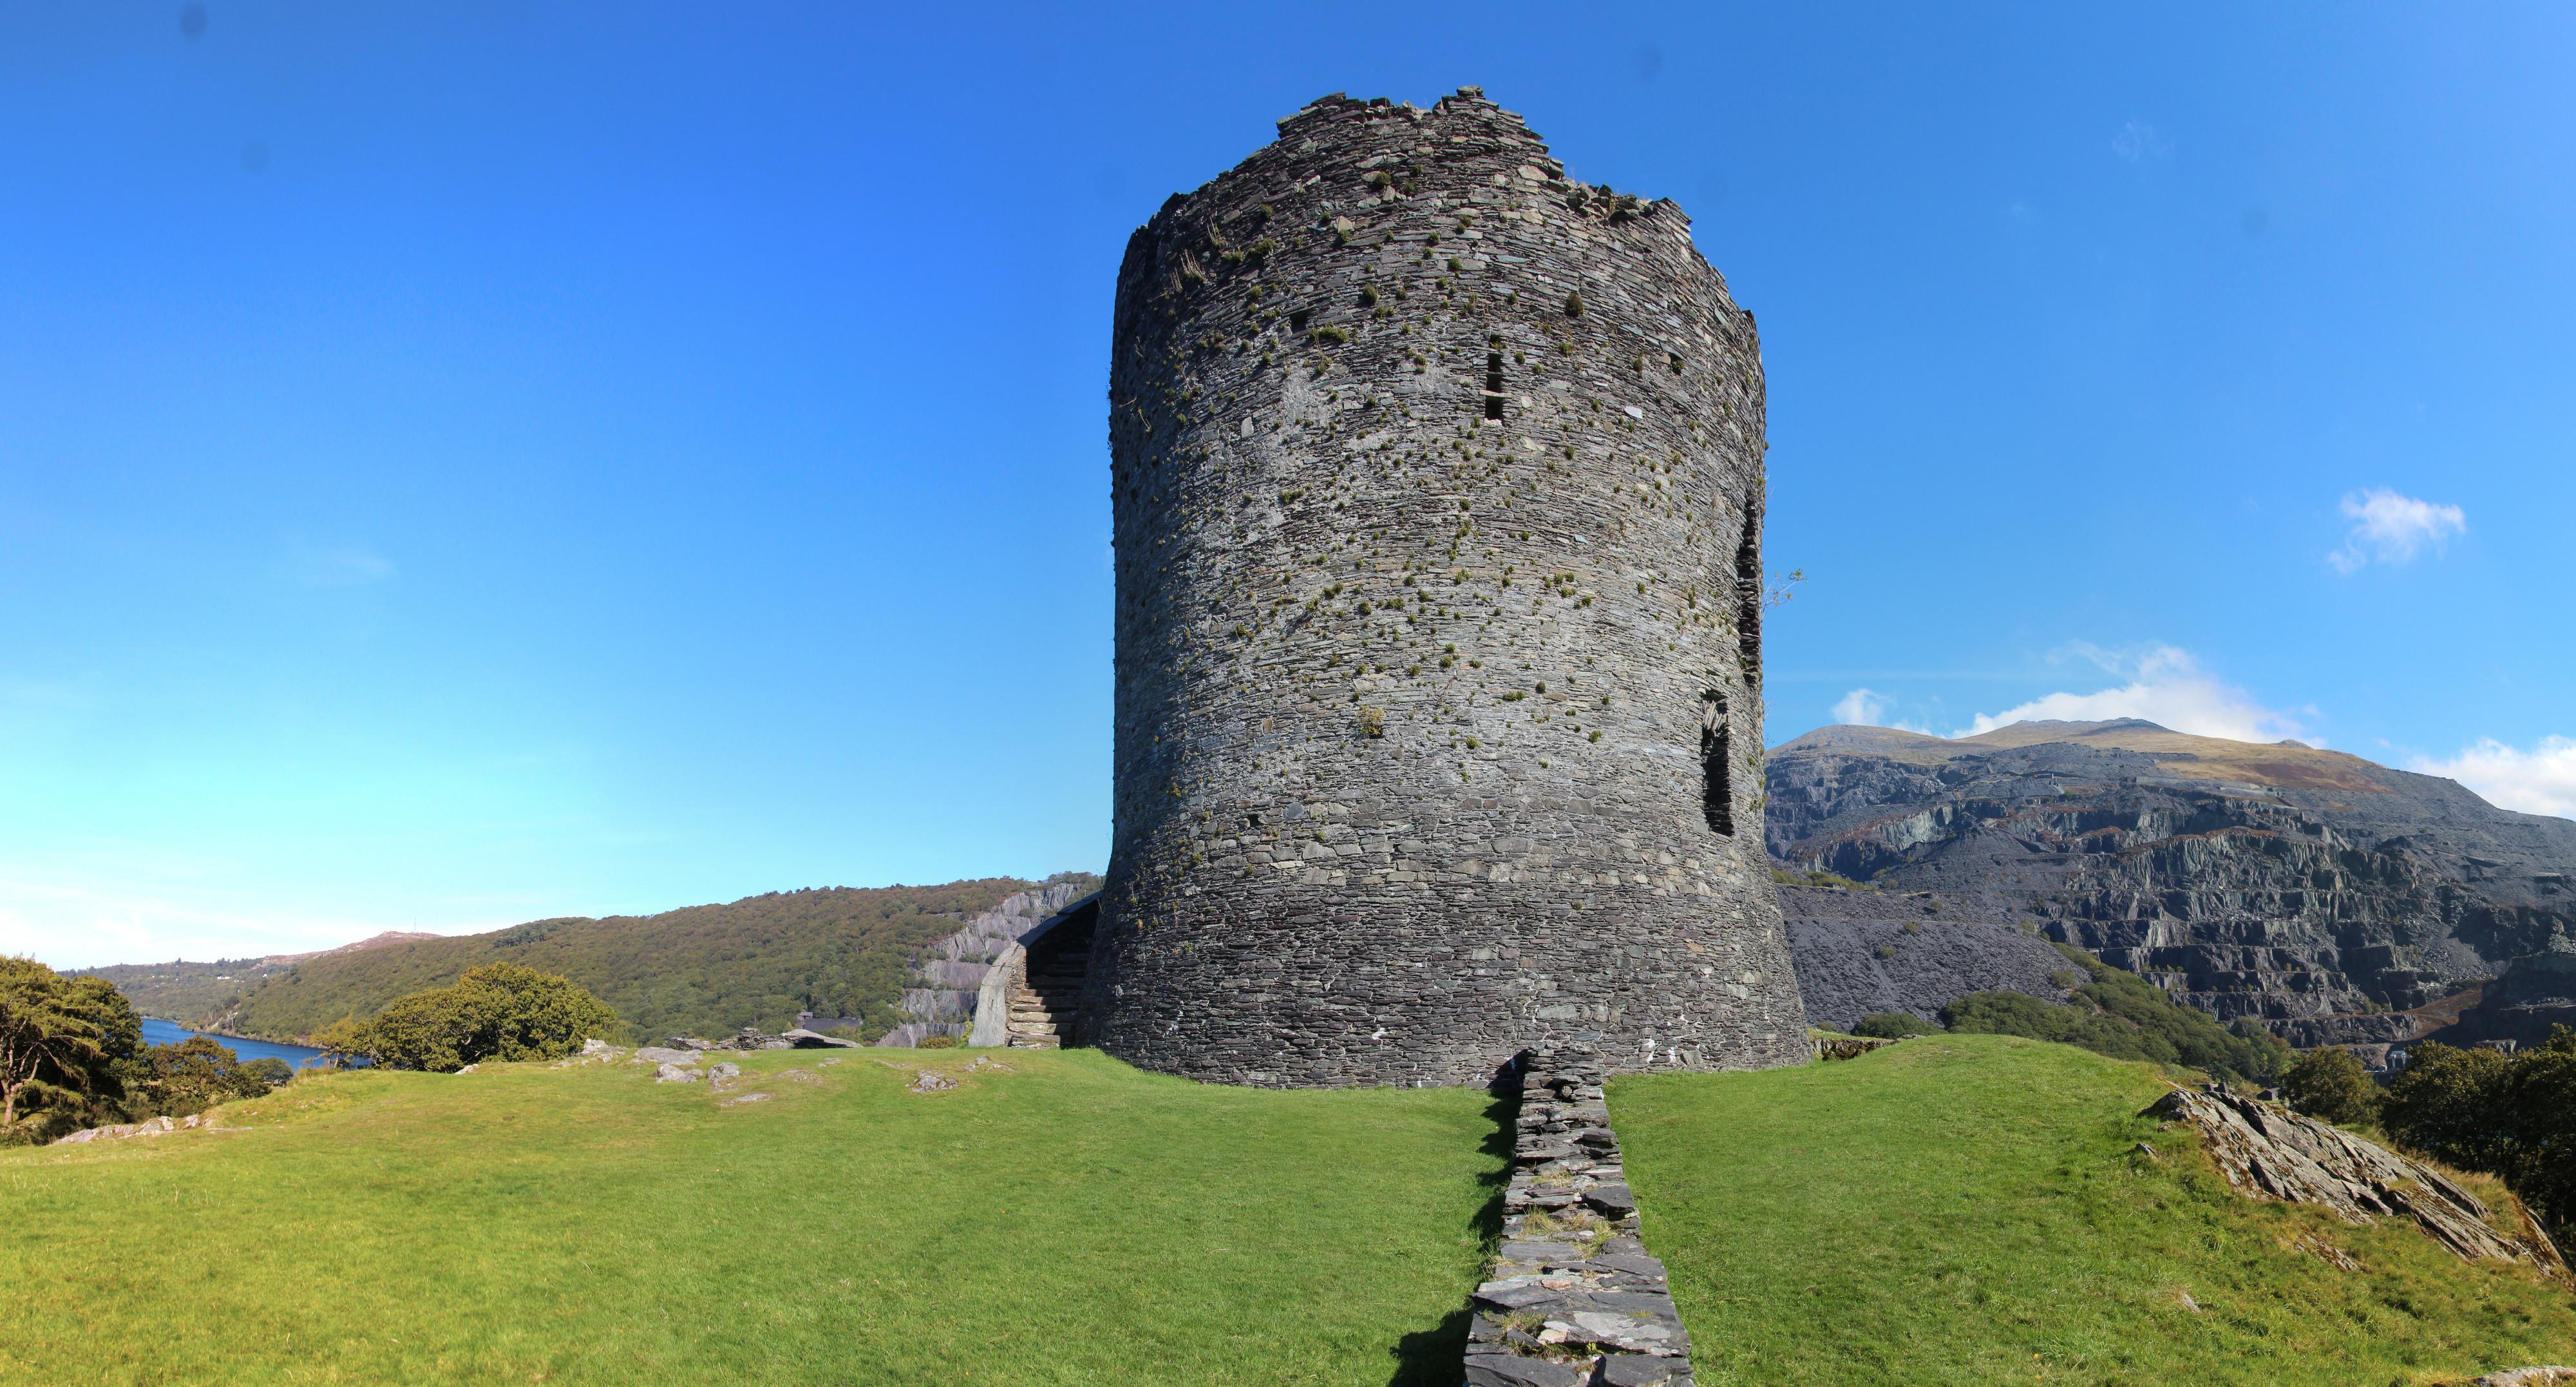 Castle Dolbadarn ruins, Llanberis